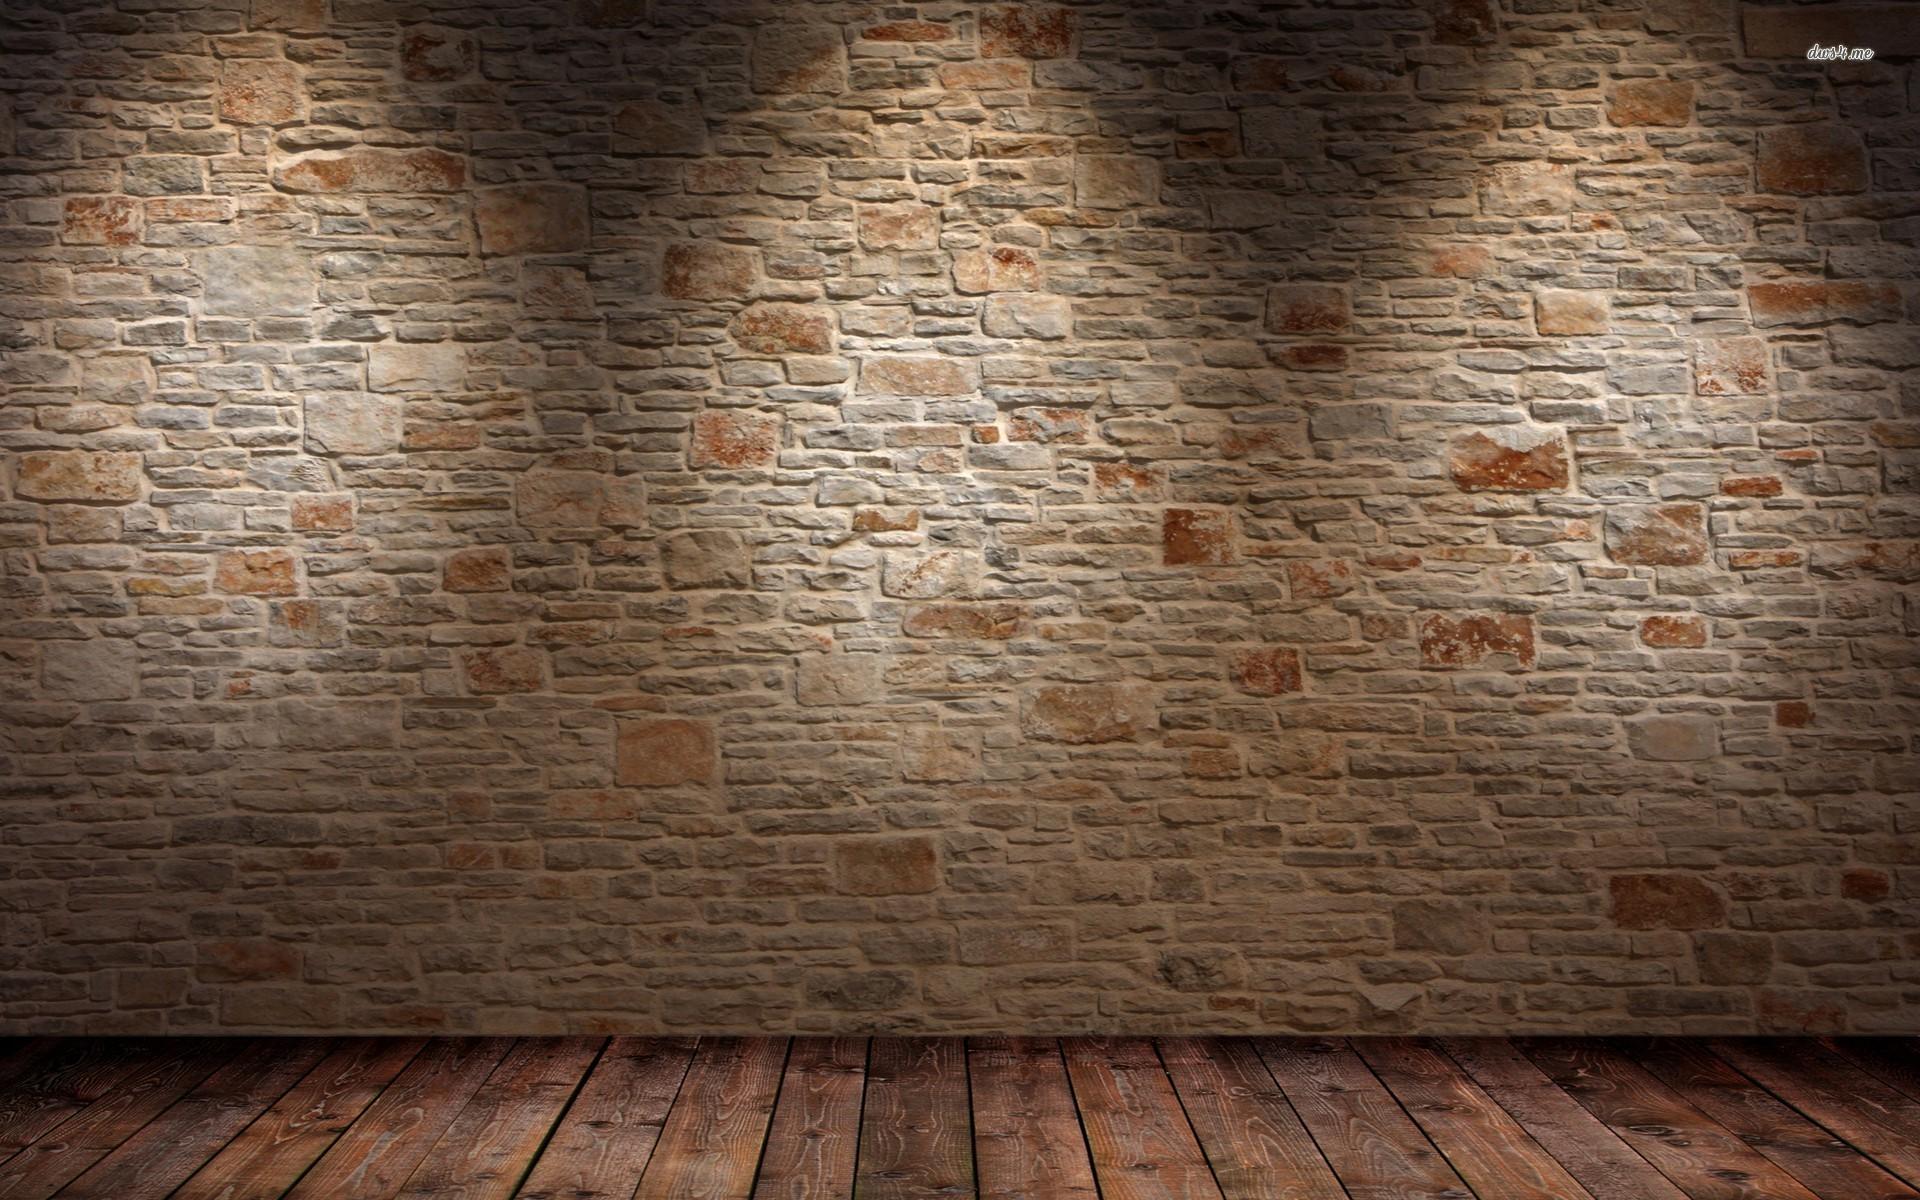 Res: 1920x1200, Brick Wall And Wood Floor Hd Wallpaper Abstract Desktop Widescreen For  Walls Of Pc Pics